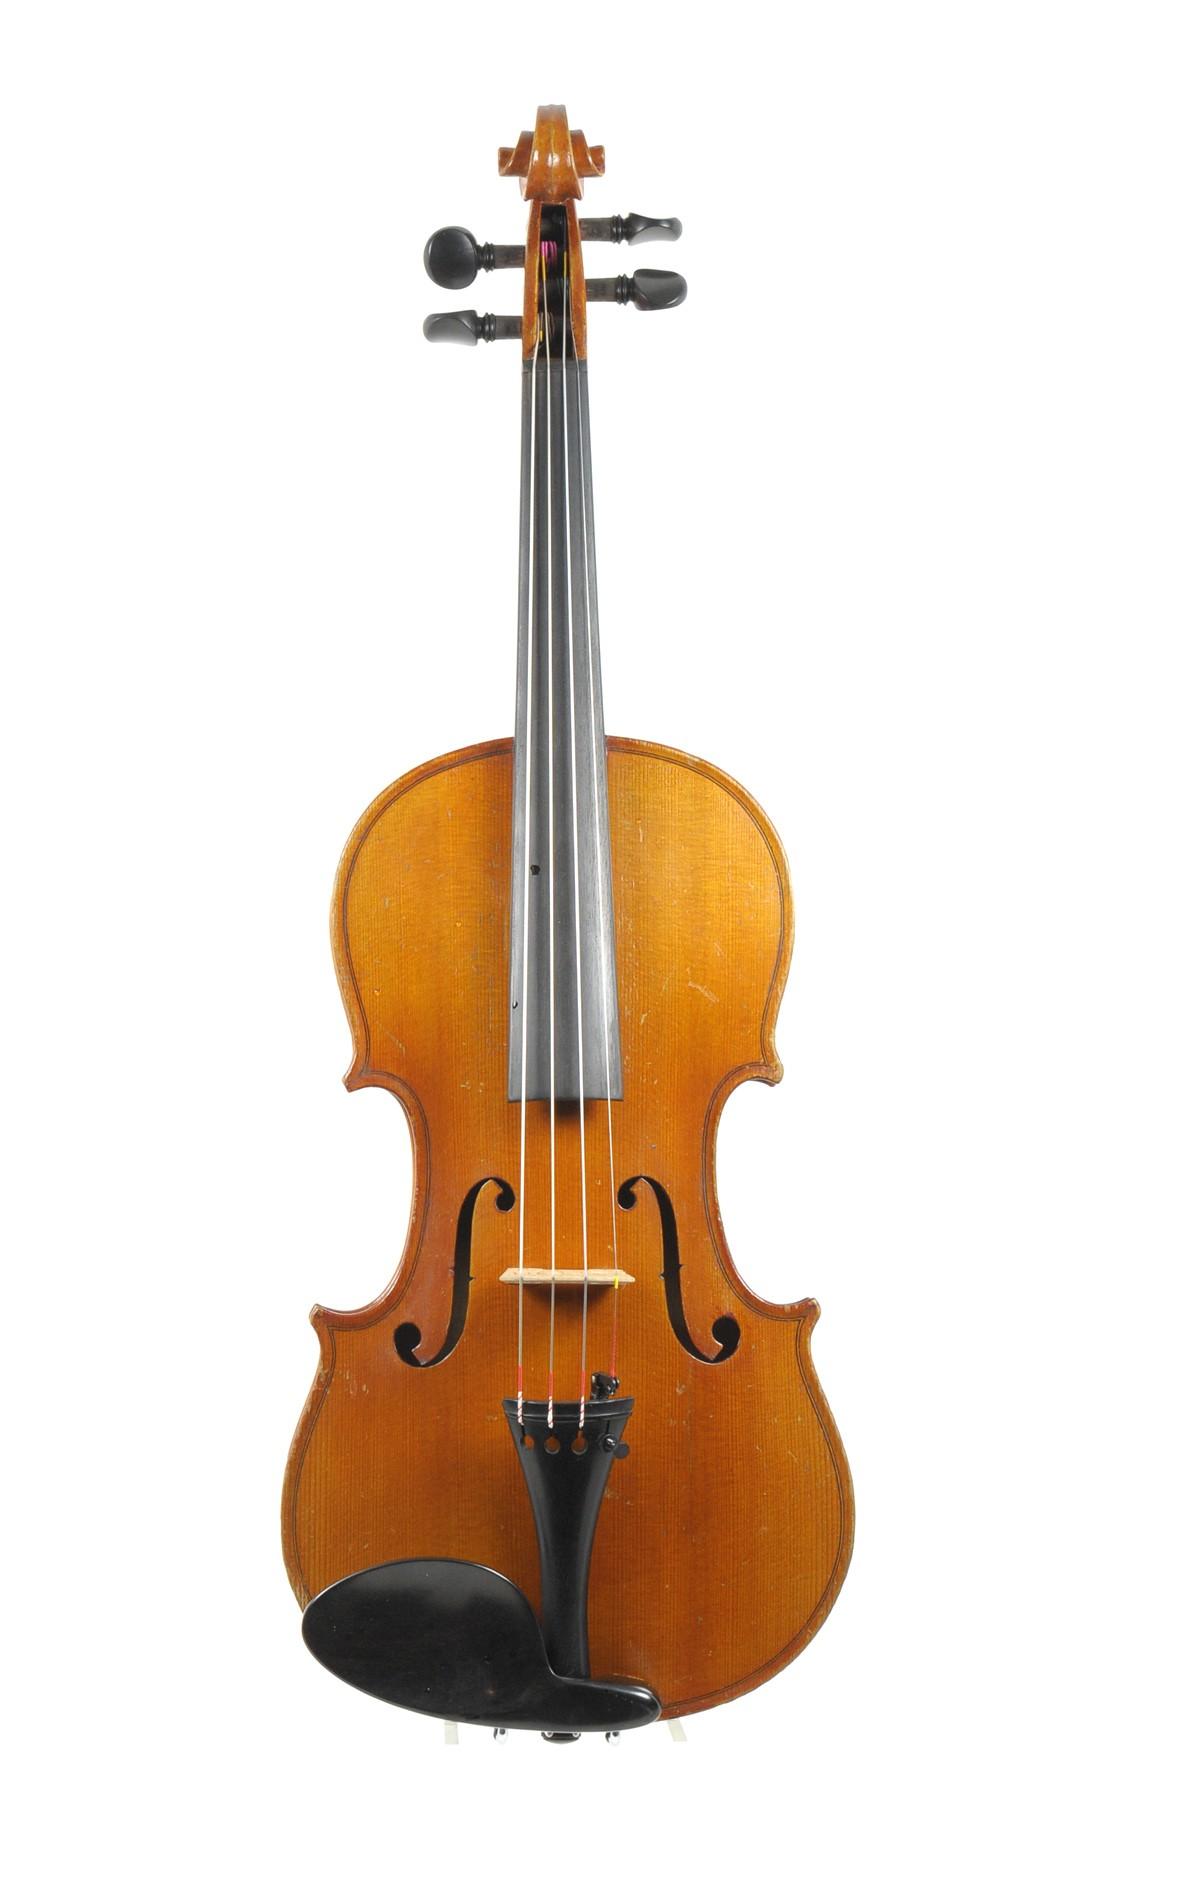 Strong sounding 3/4 violin, Mirecourt